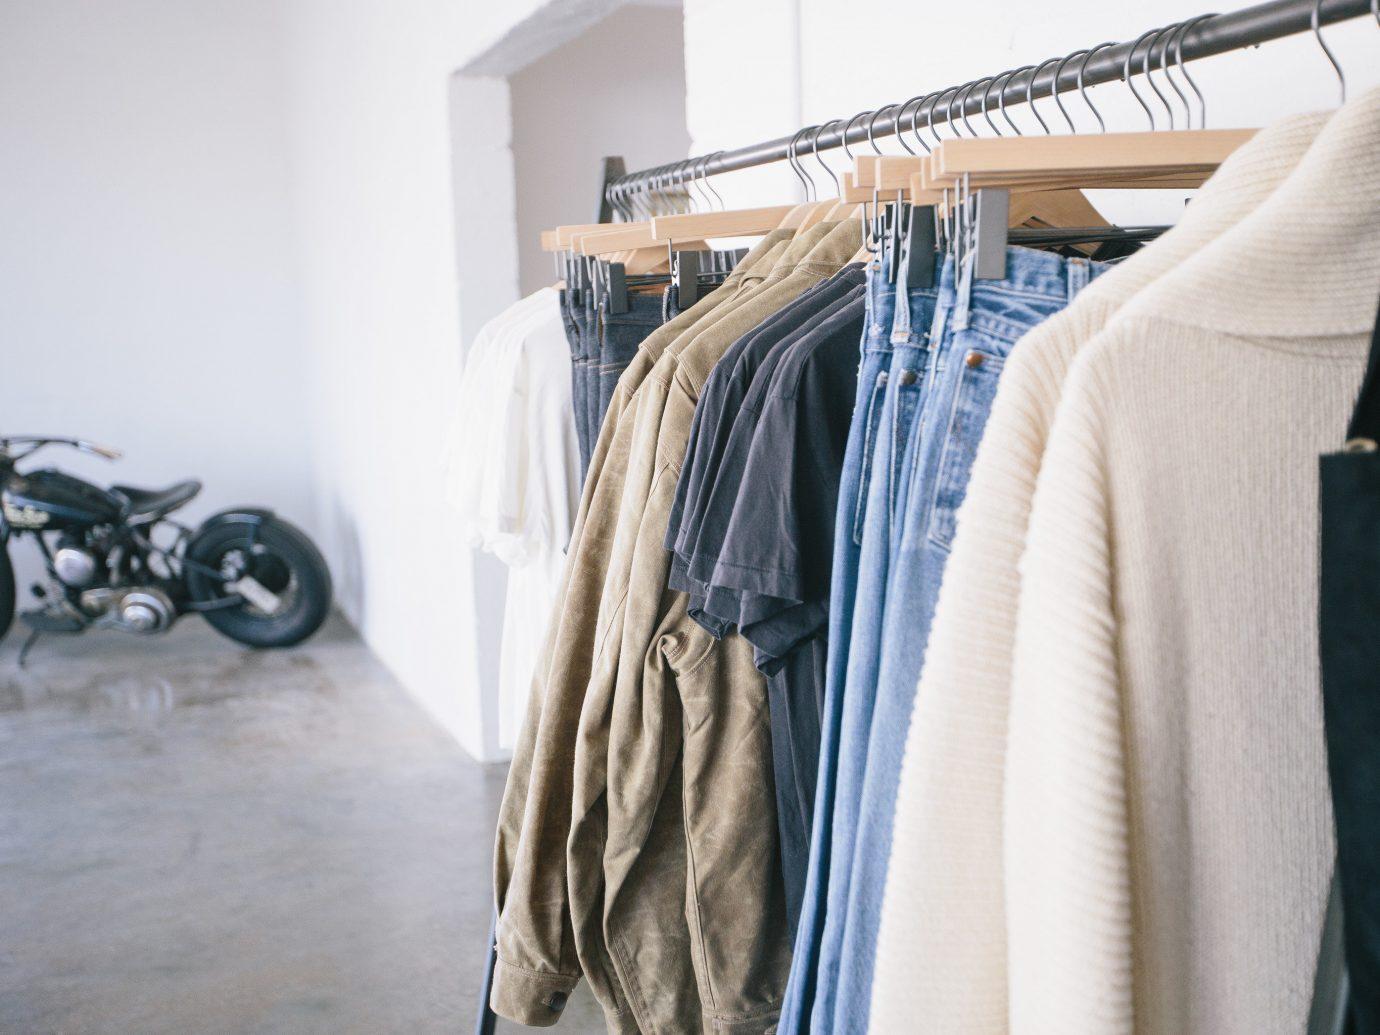 Jetsetter Guides clothing room indoor dress interior design textile closet rack